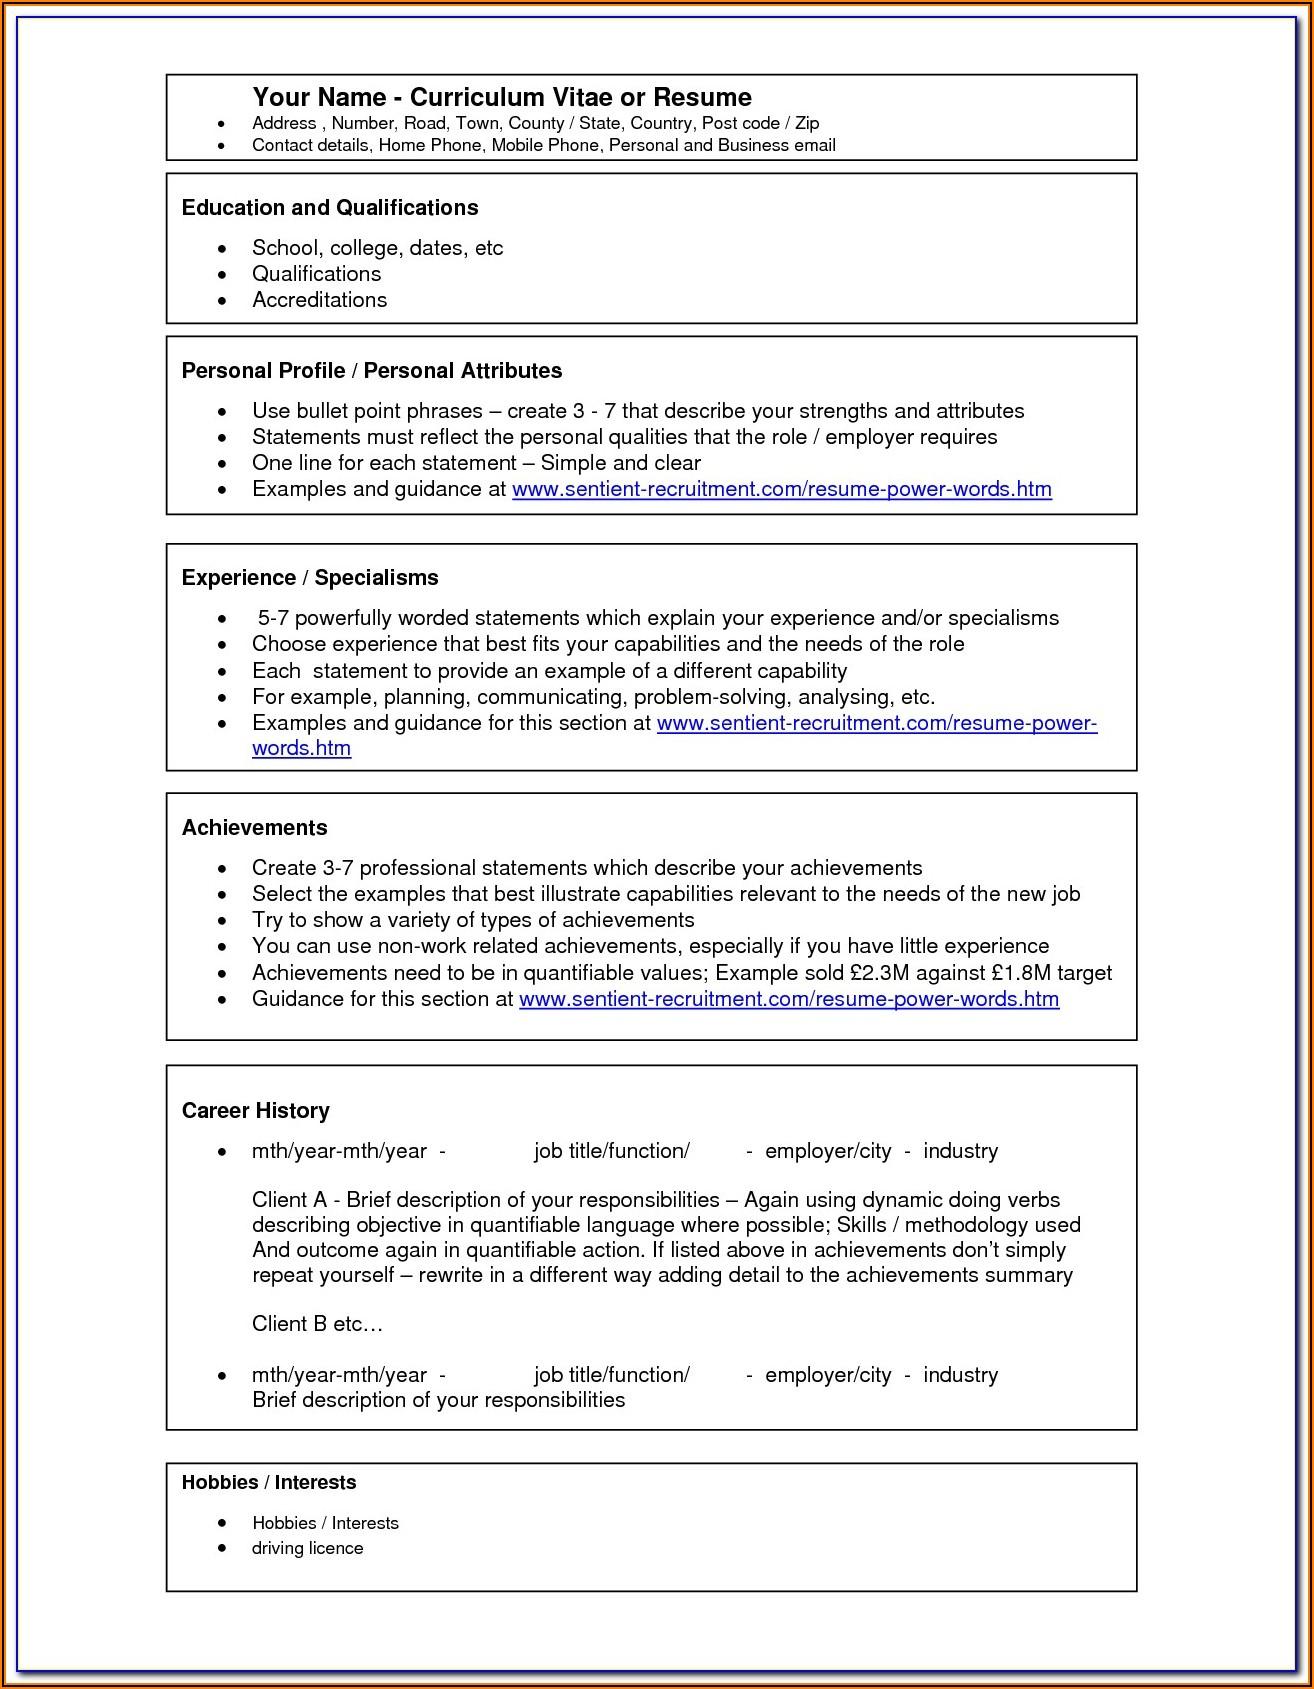 Free Resume Templates Word 2010